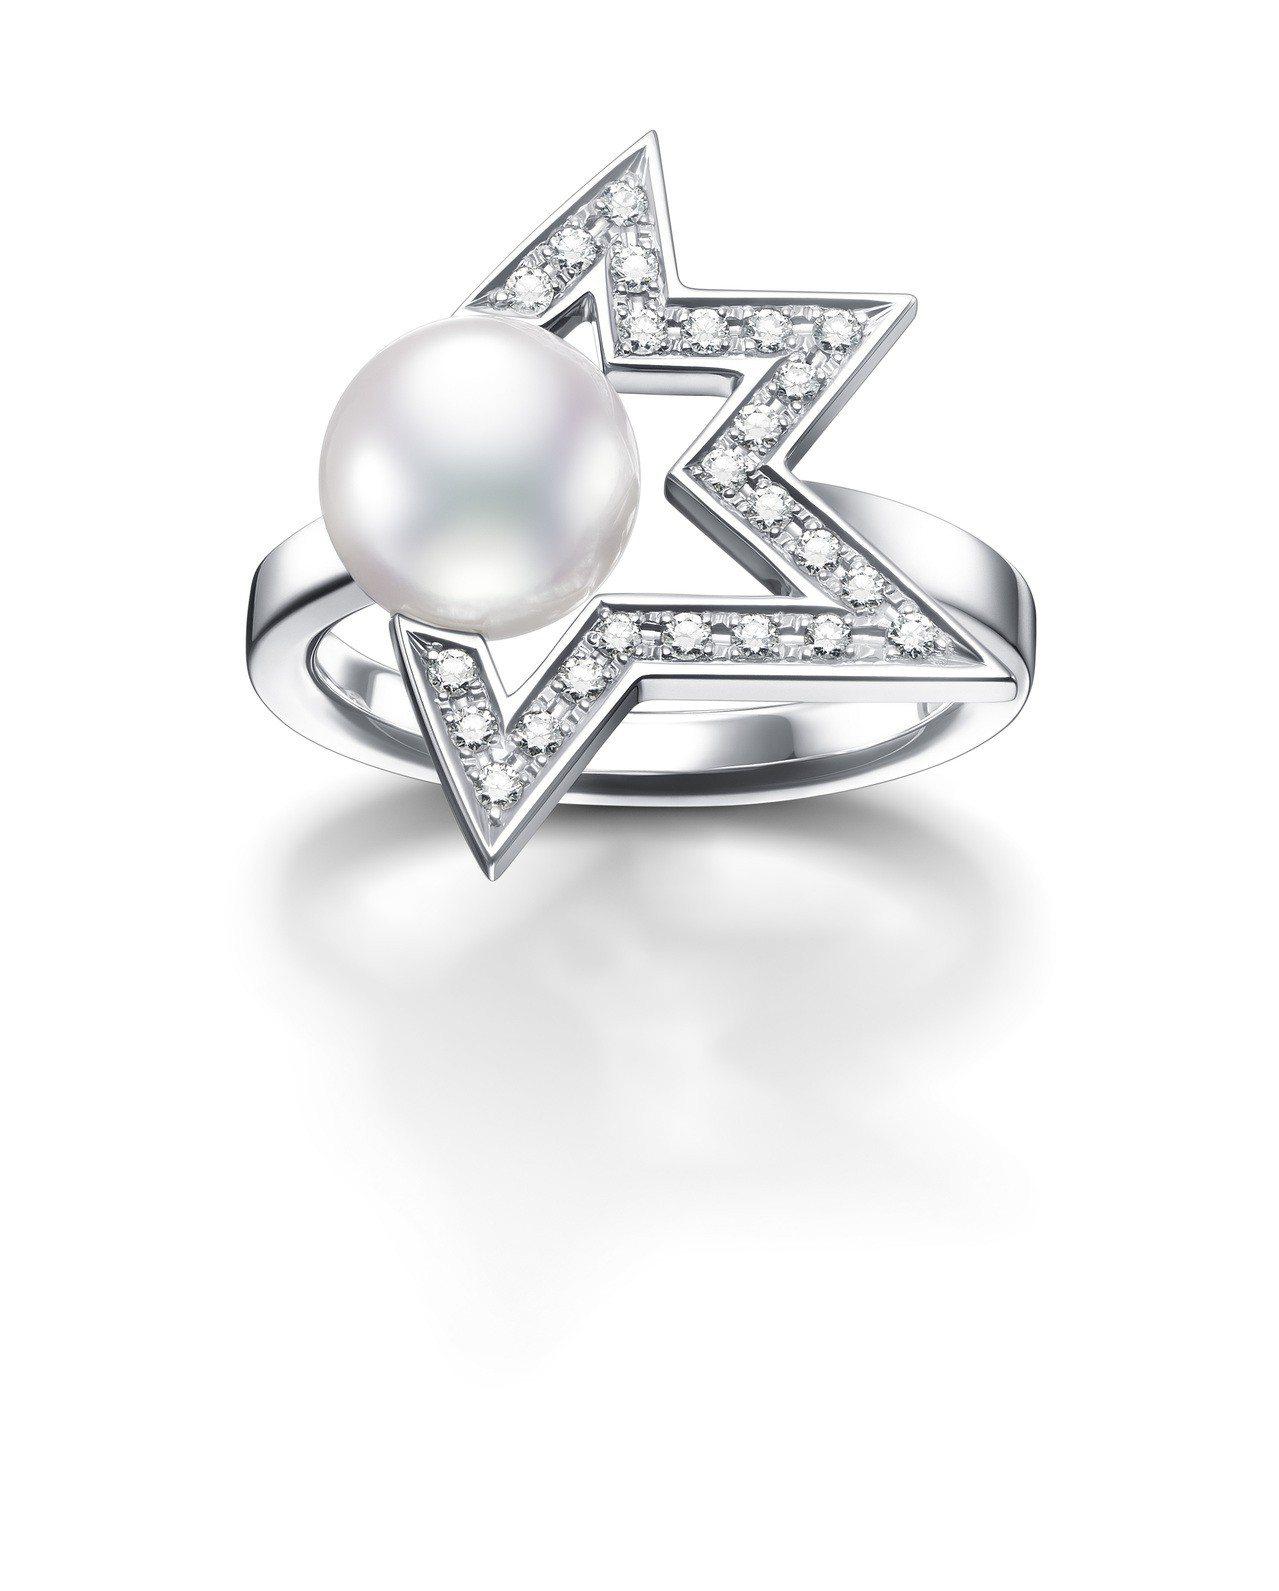 TASAKI comet plus diamond 鑽石珍珠白K金戒指,10萬3...